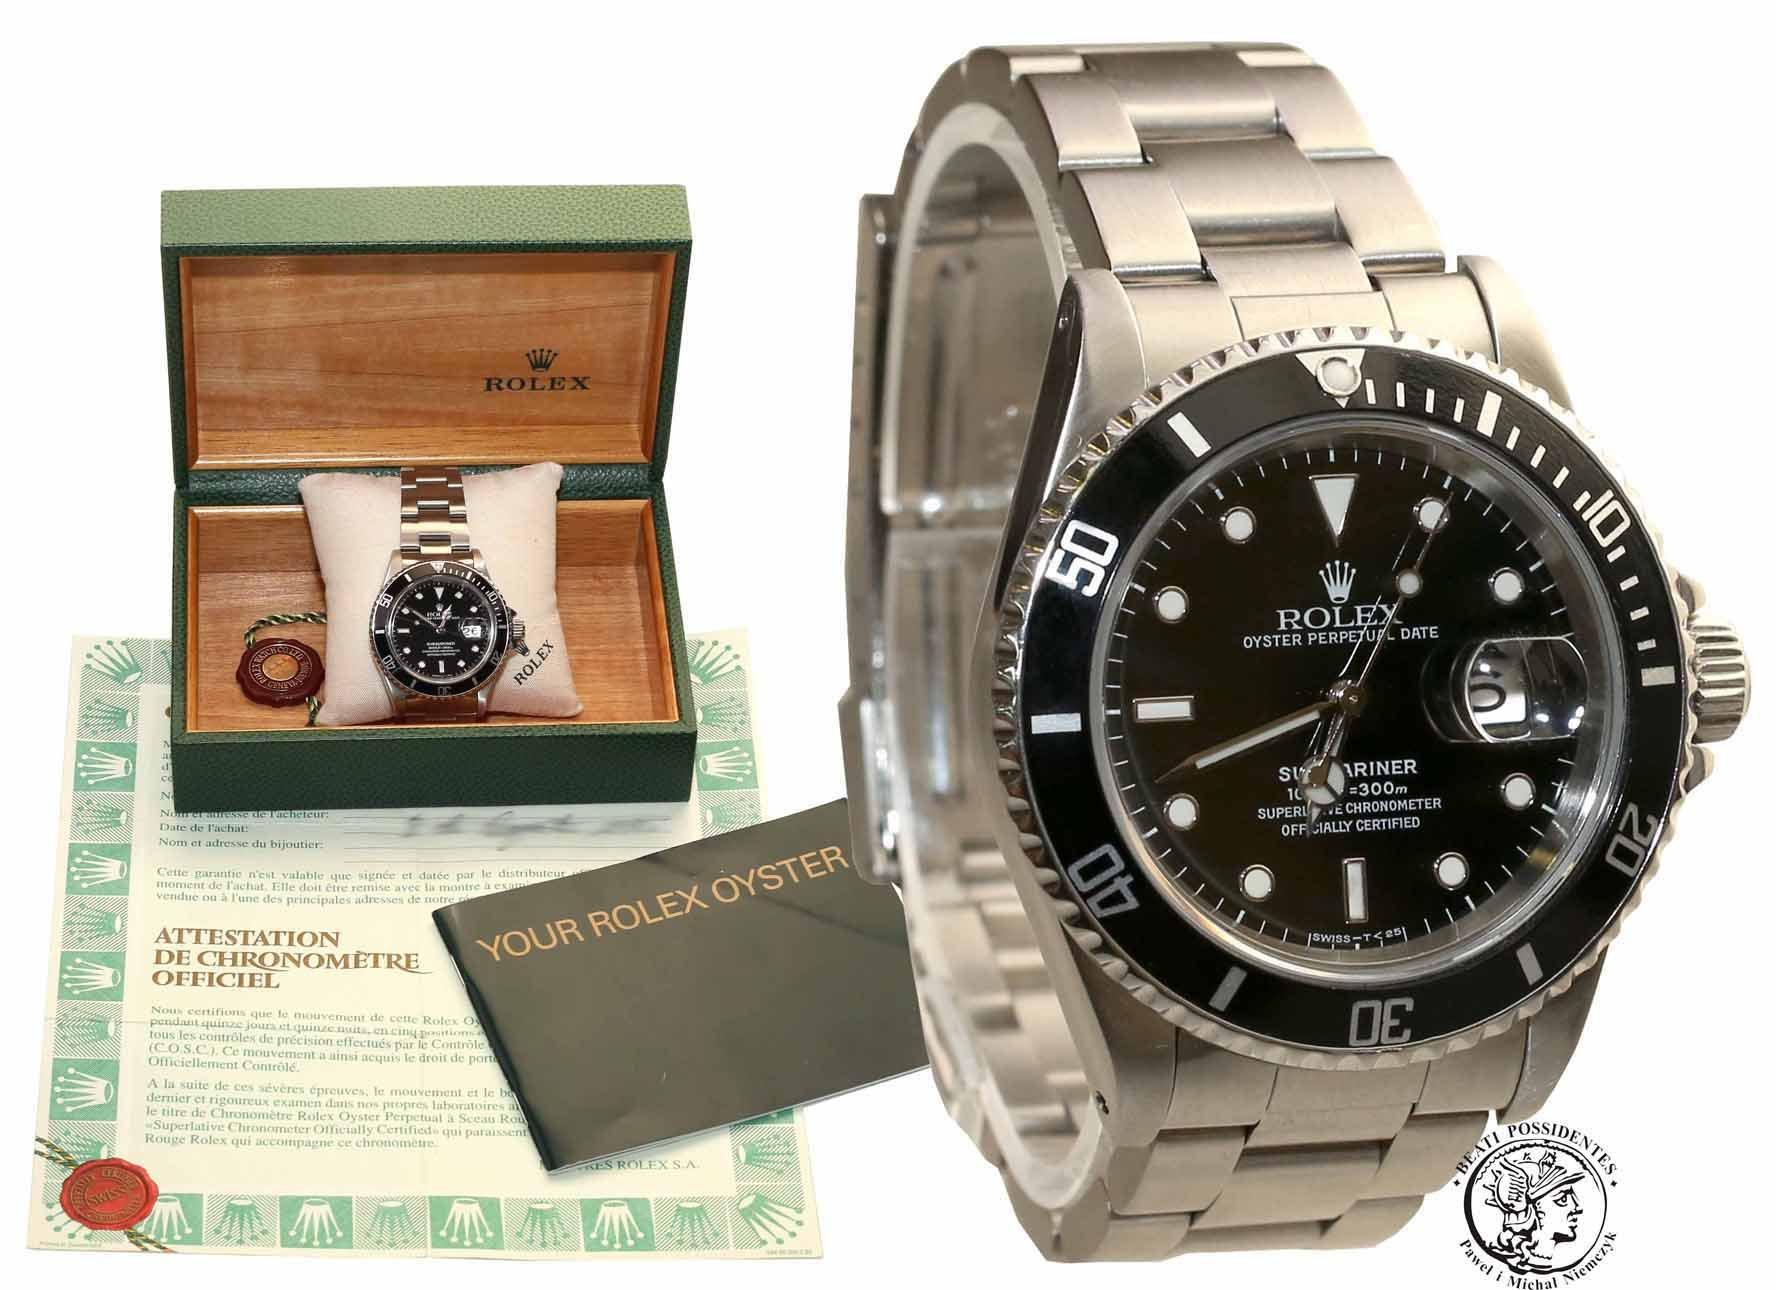 Zegarek Rolex Oyster Perpetual Submariner Date Czarny - Ref. 16610